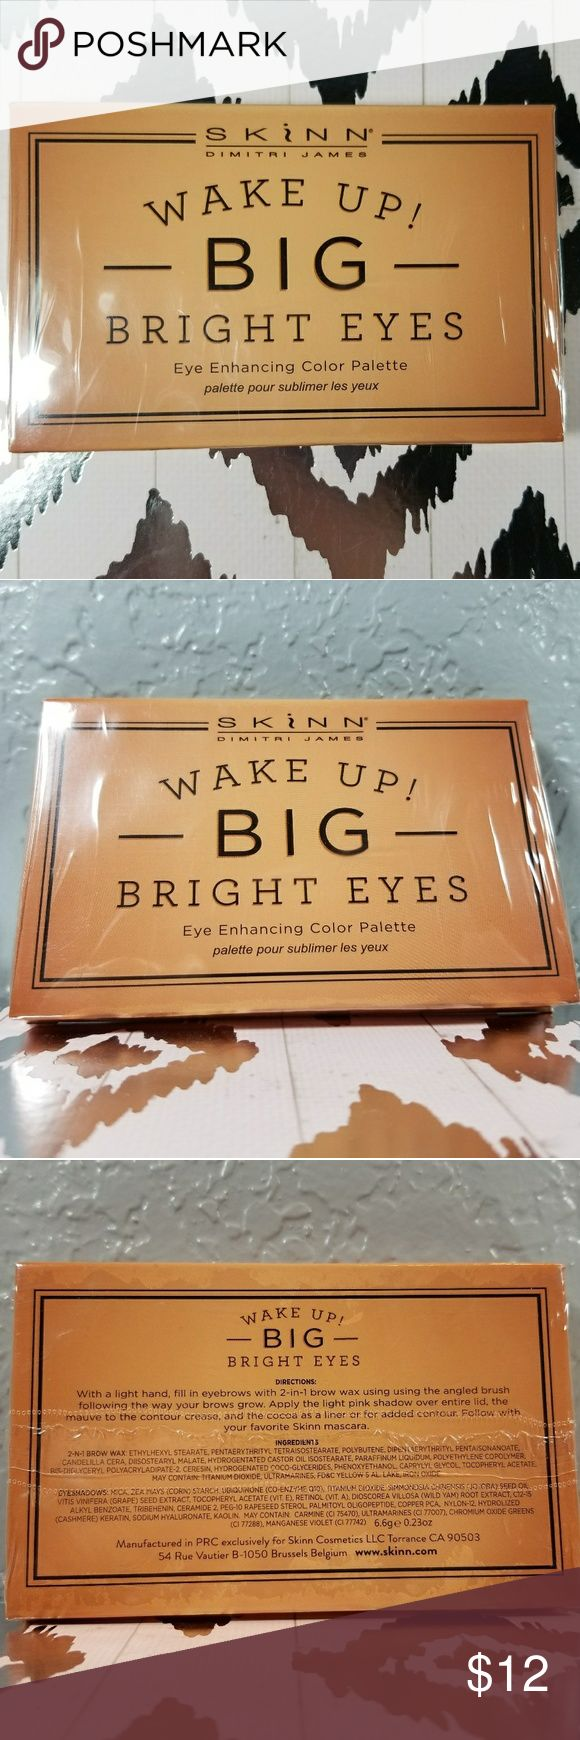 Skinn Wake Up! Big Bright Eyes eyeshadow/brow wax NWT